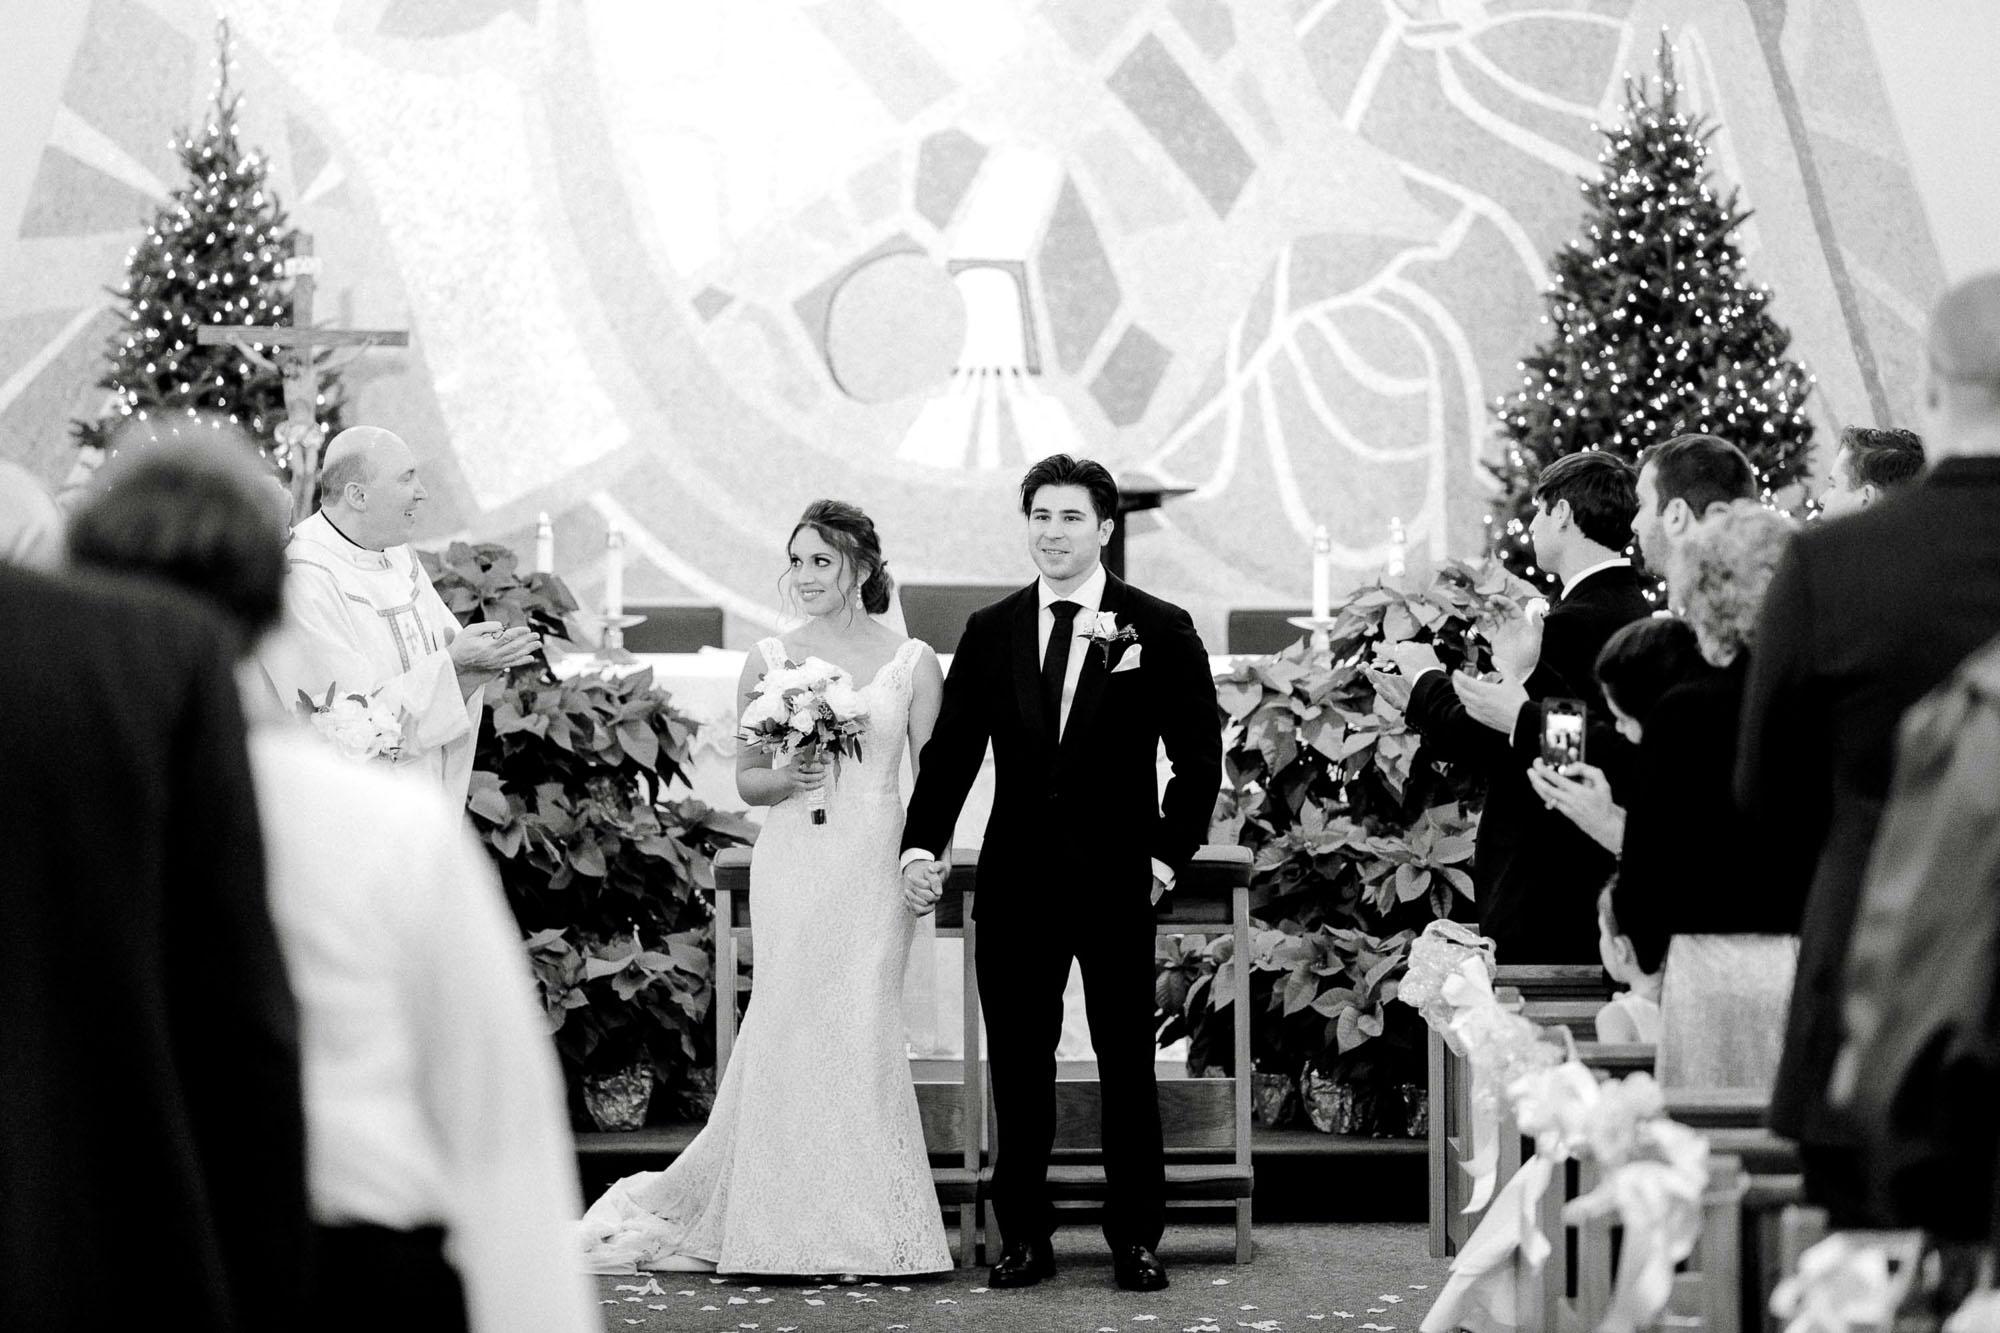 snowy-sand-springs-country-club-drums-pa-christmas-wedding-24498.jpg